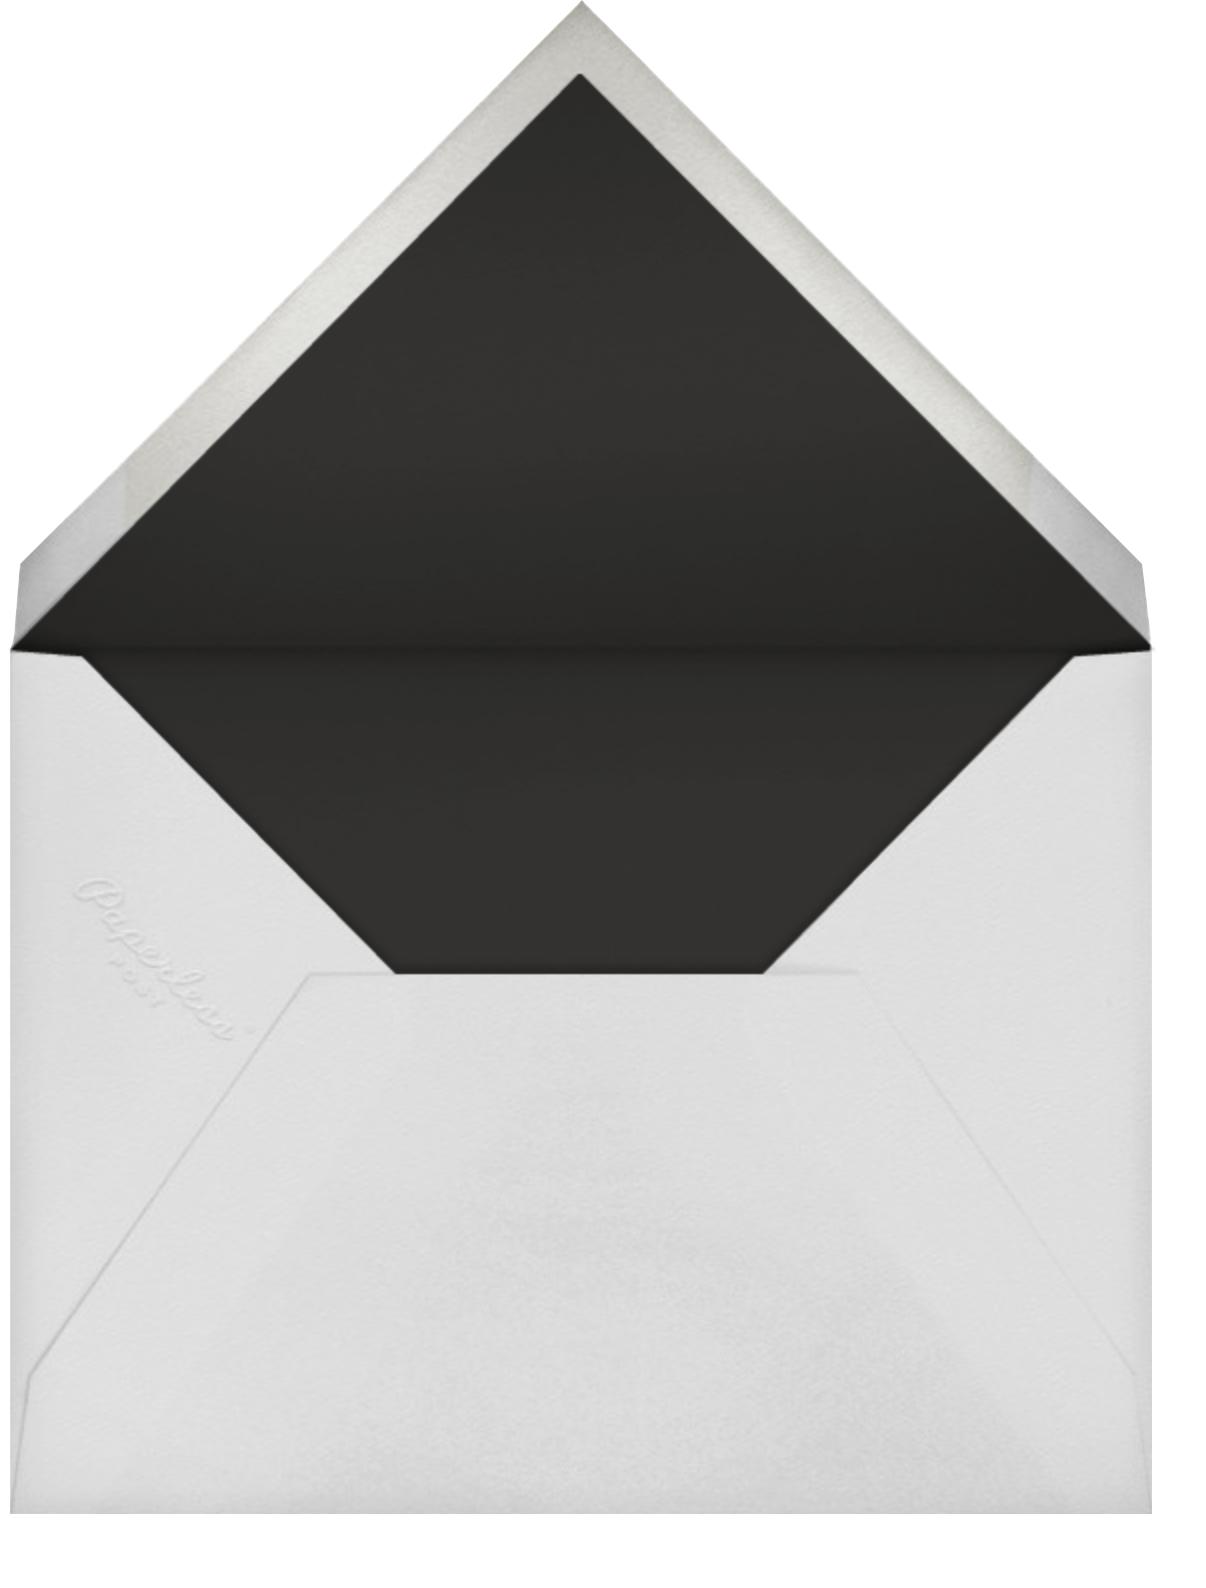 Liaison (Thank You) - Kelly Wearstler - Personalized stationery - envelope back